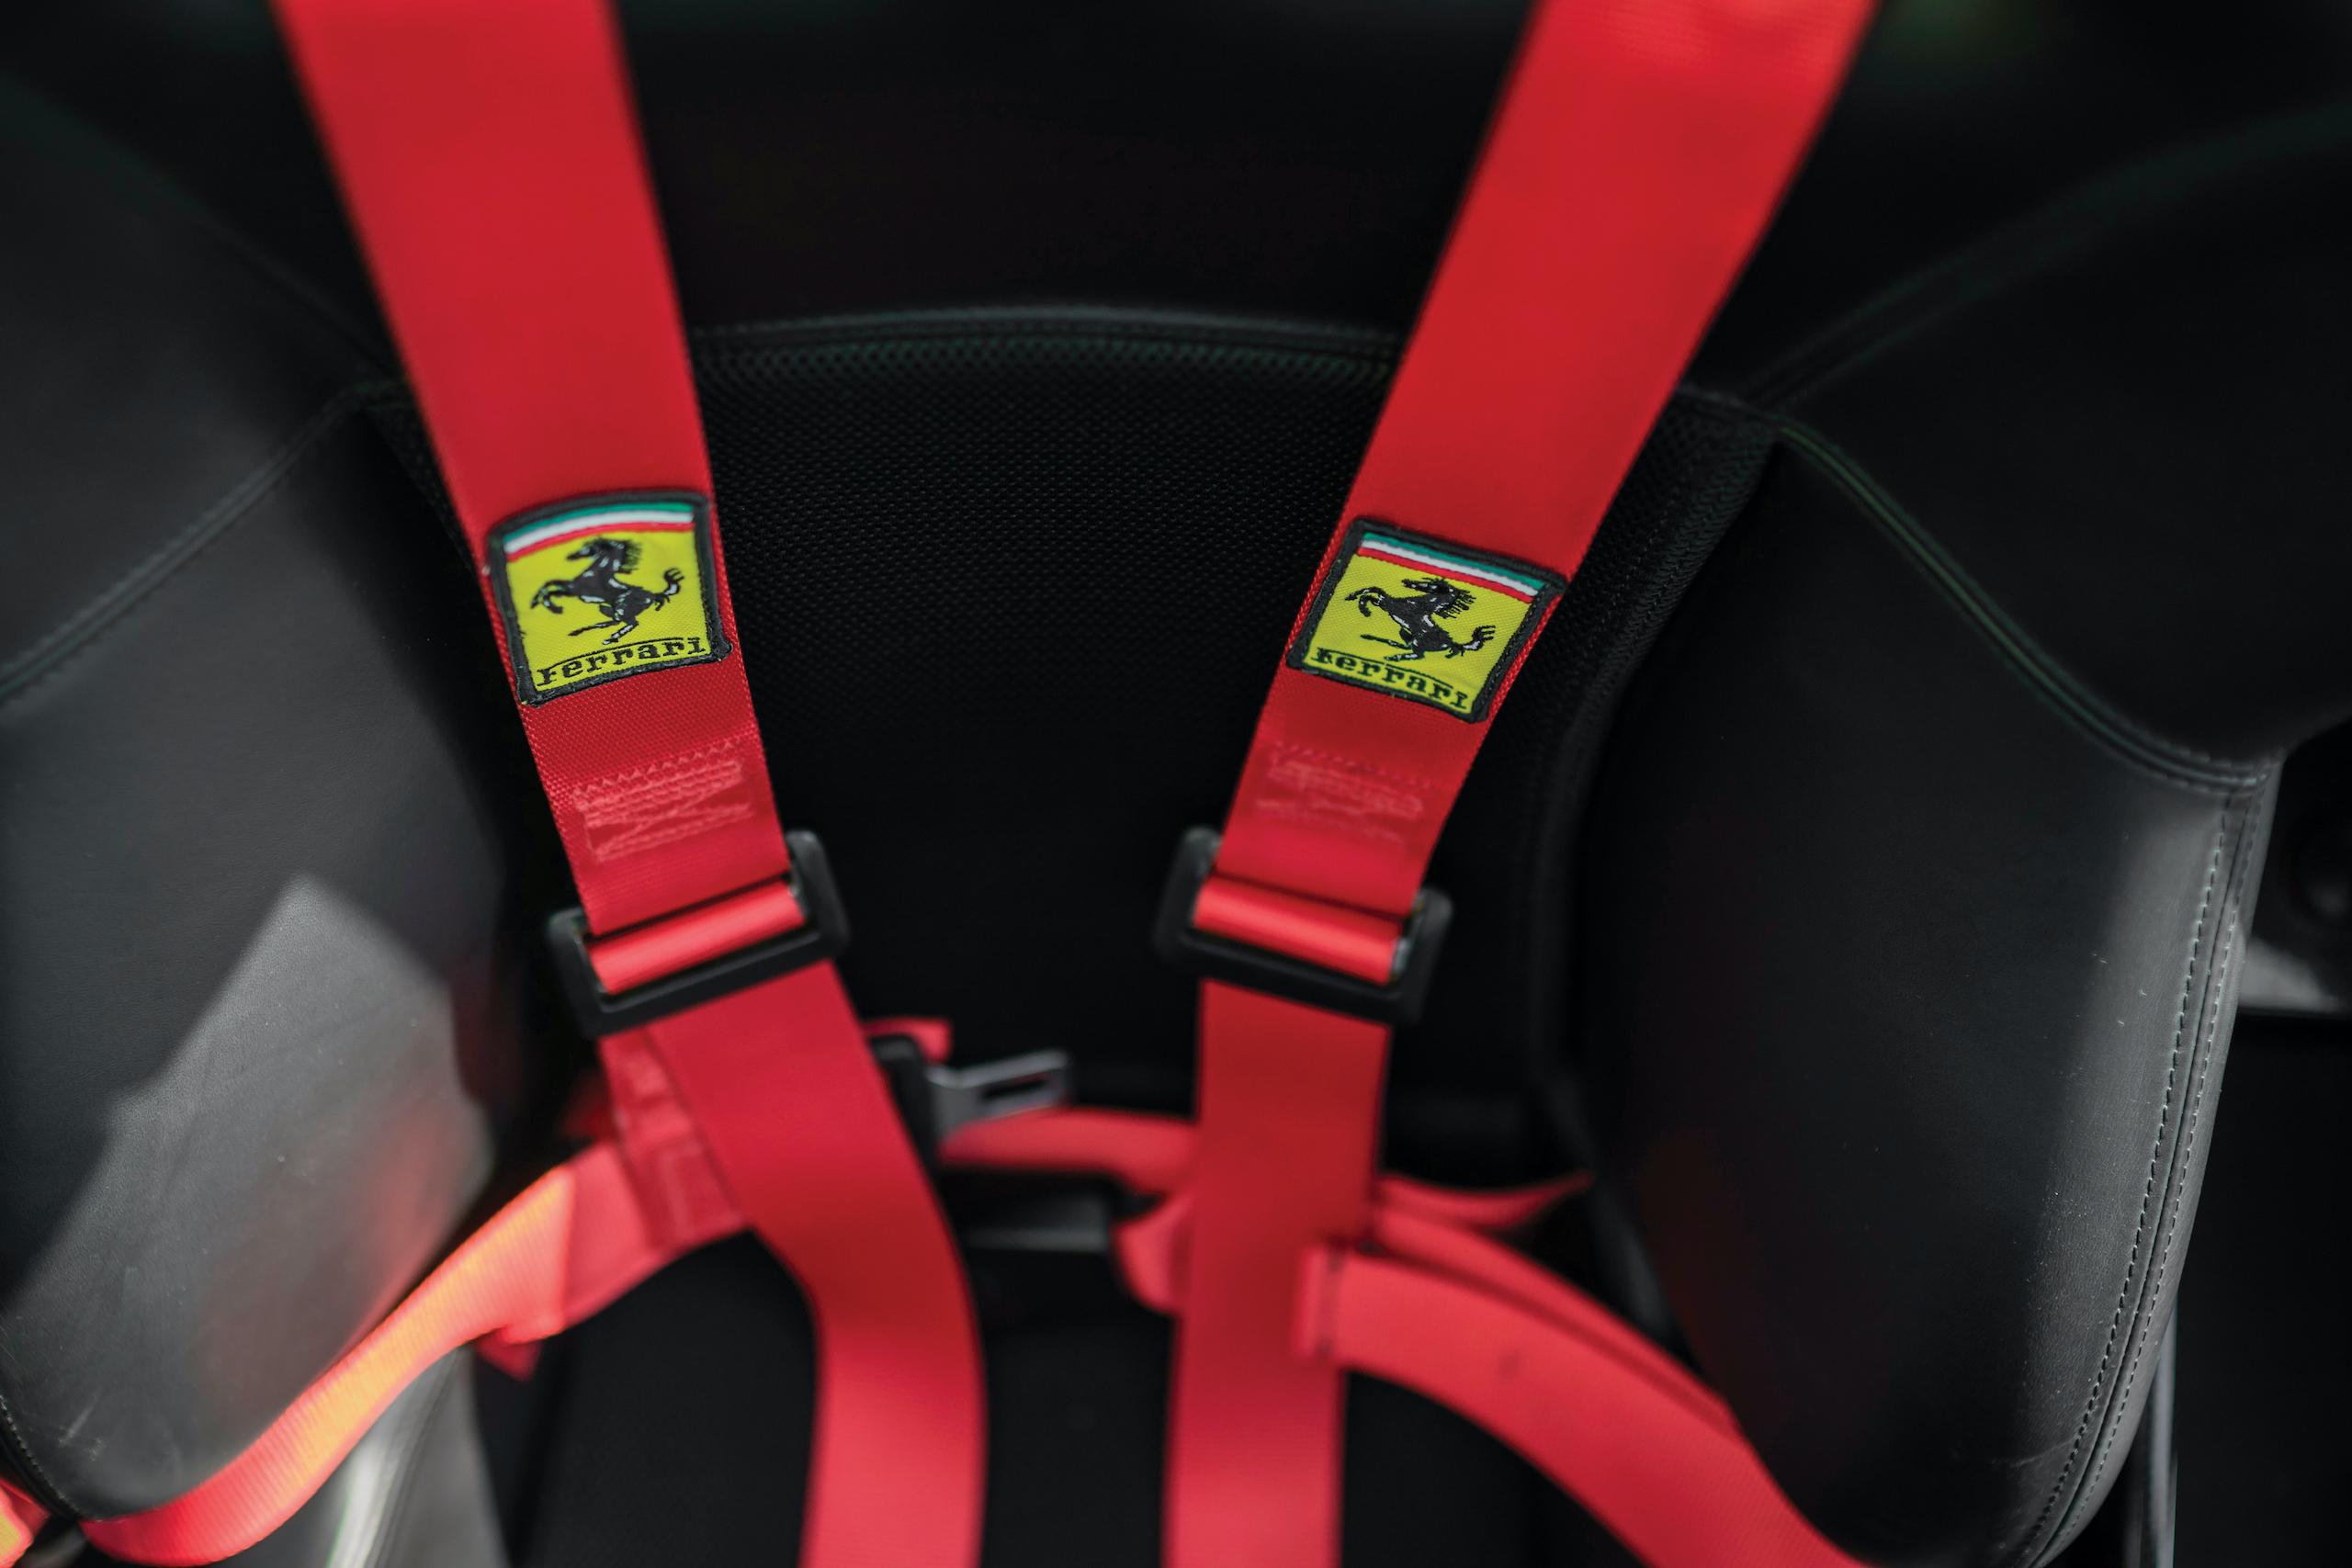 2003 Ferrari Enzo seatbelt harness detail